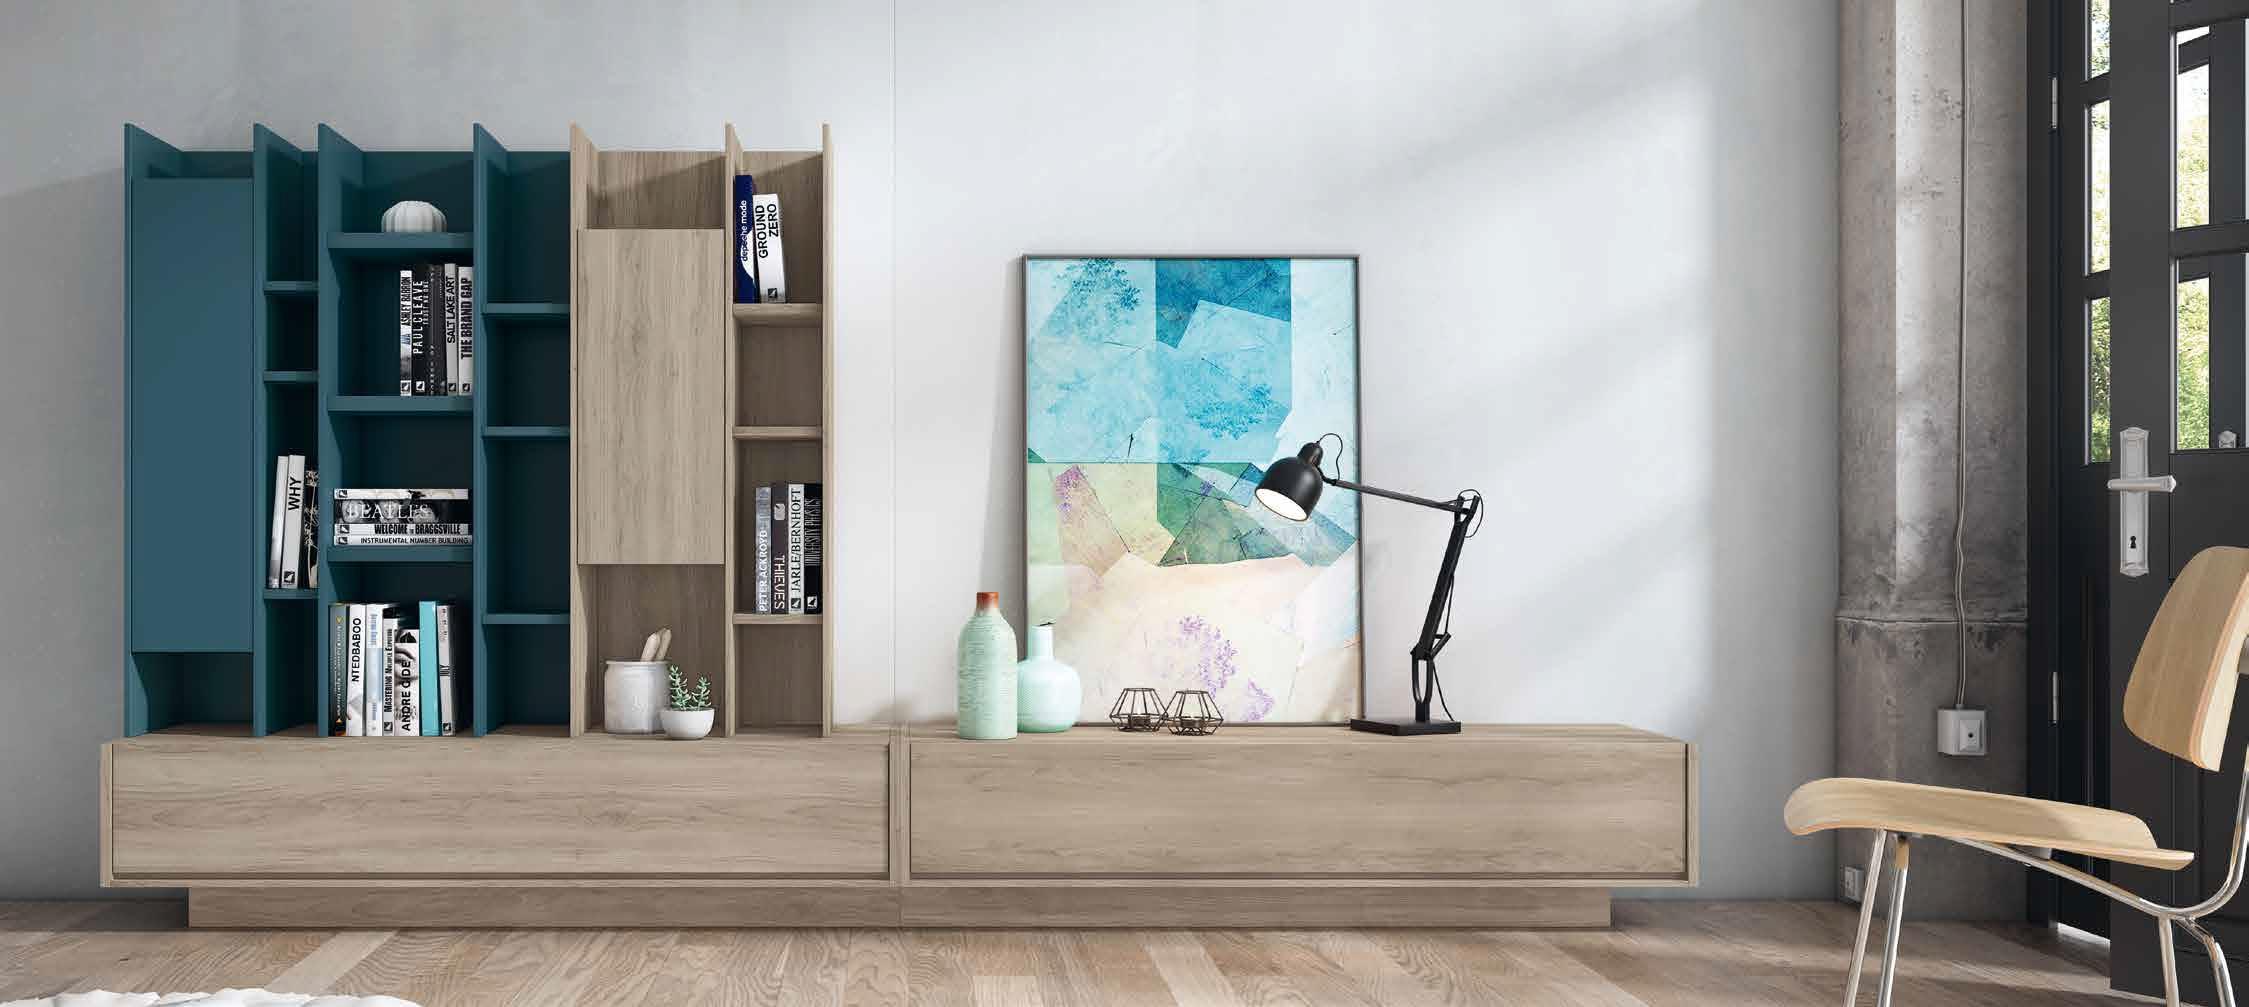 salon-moderno-Nativ-2019-muebles-paco-caballero-0920-5c8ceab82abfc